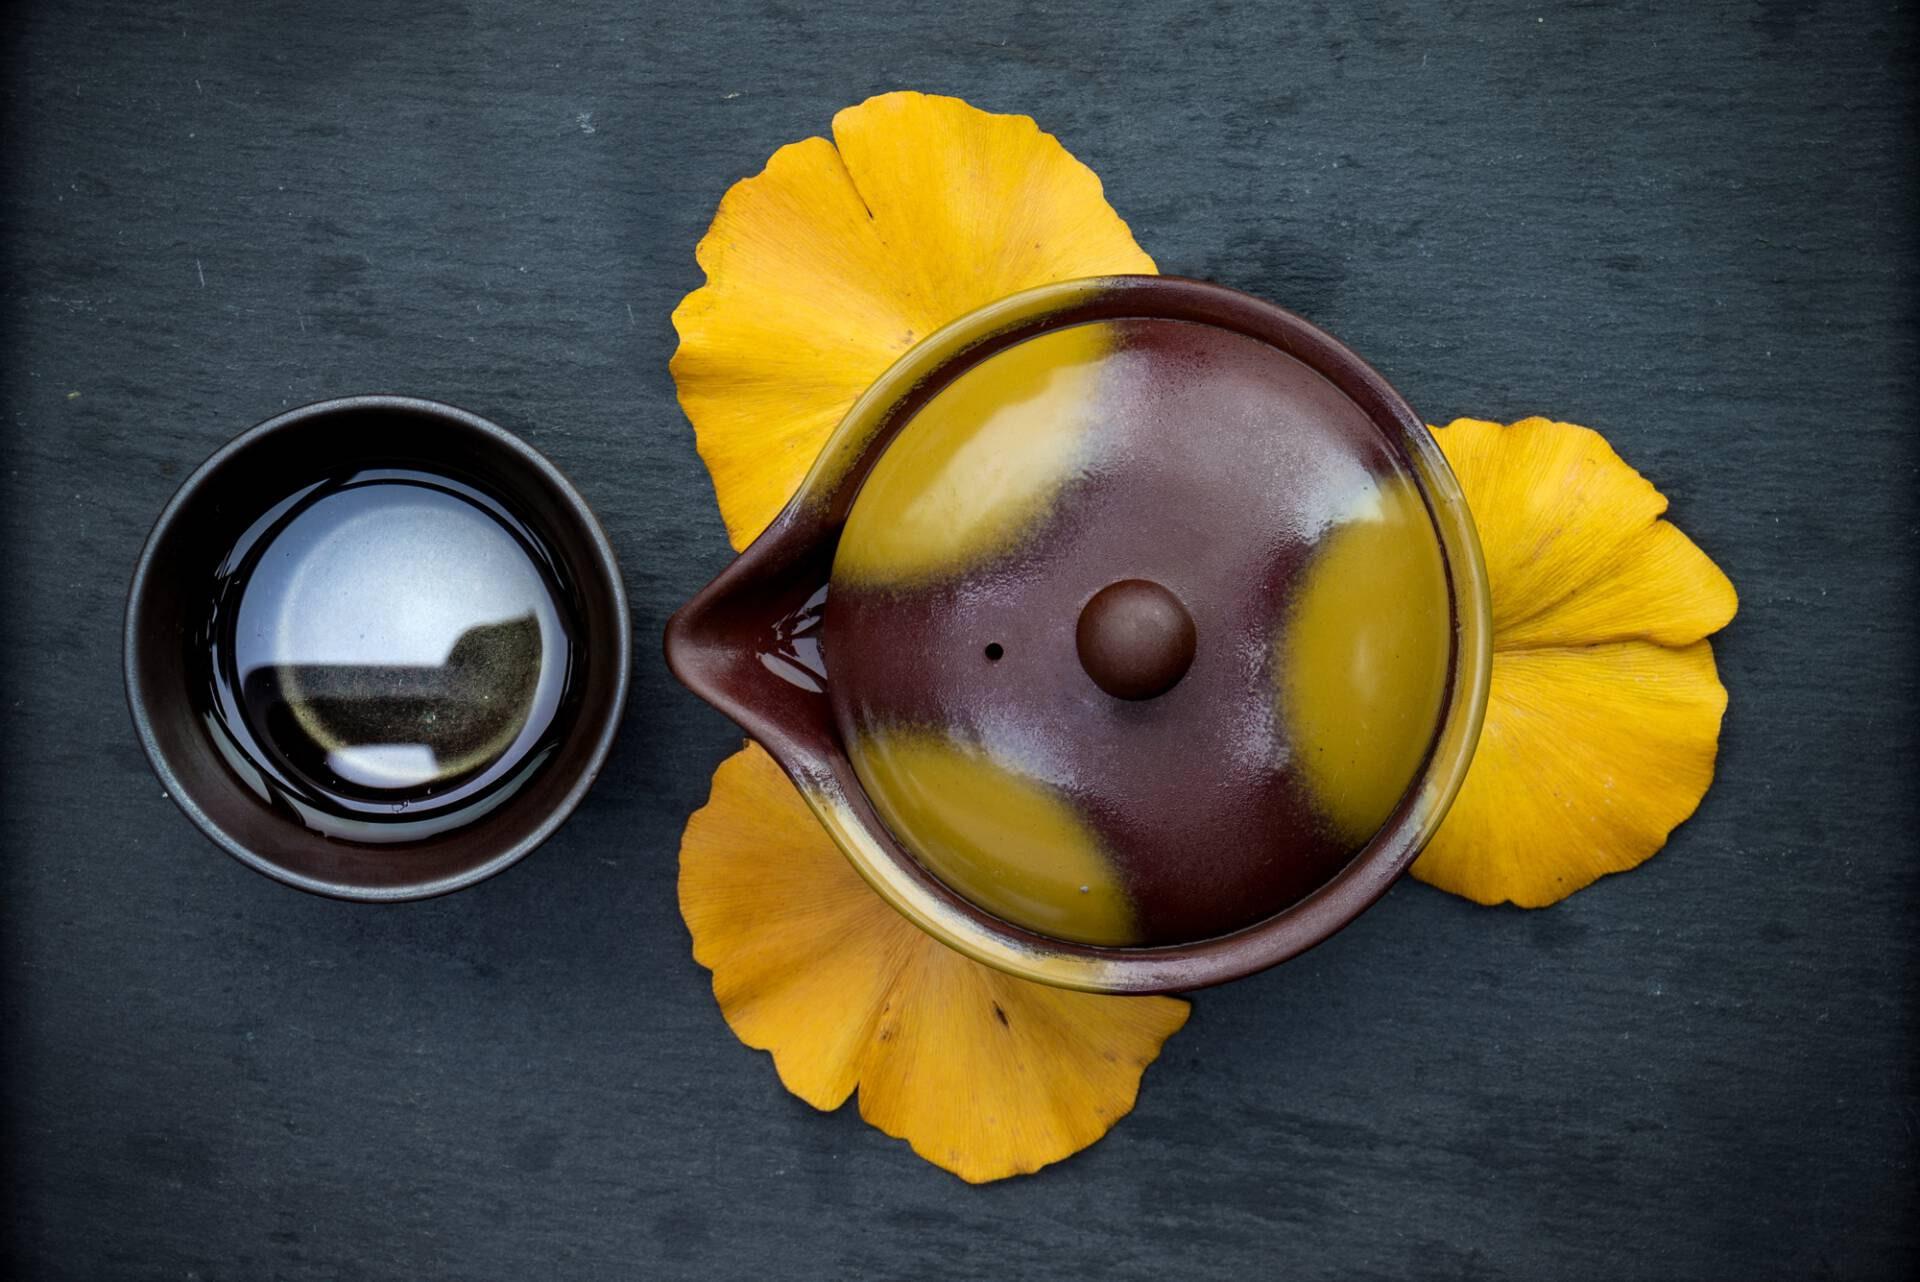 Tea Passion_Sven-Christian Lange_Branding Photography_Japanese Ginko Gaiwan Arrangement_Brown And Yellow_Tea Bowl_On Grey Slate Tray_Green Tea_Tea Ceremony_Wabi Sabi